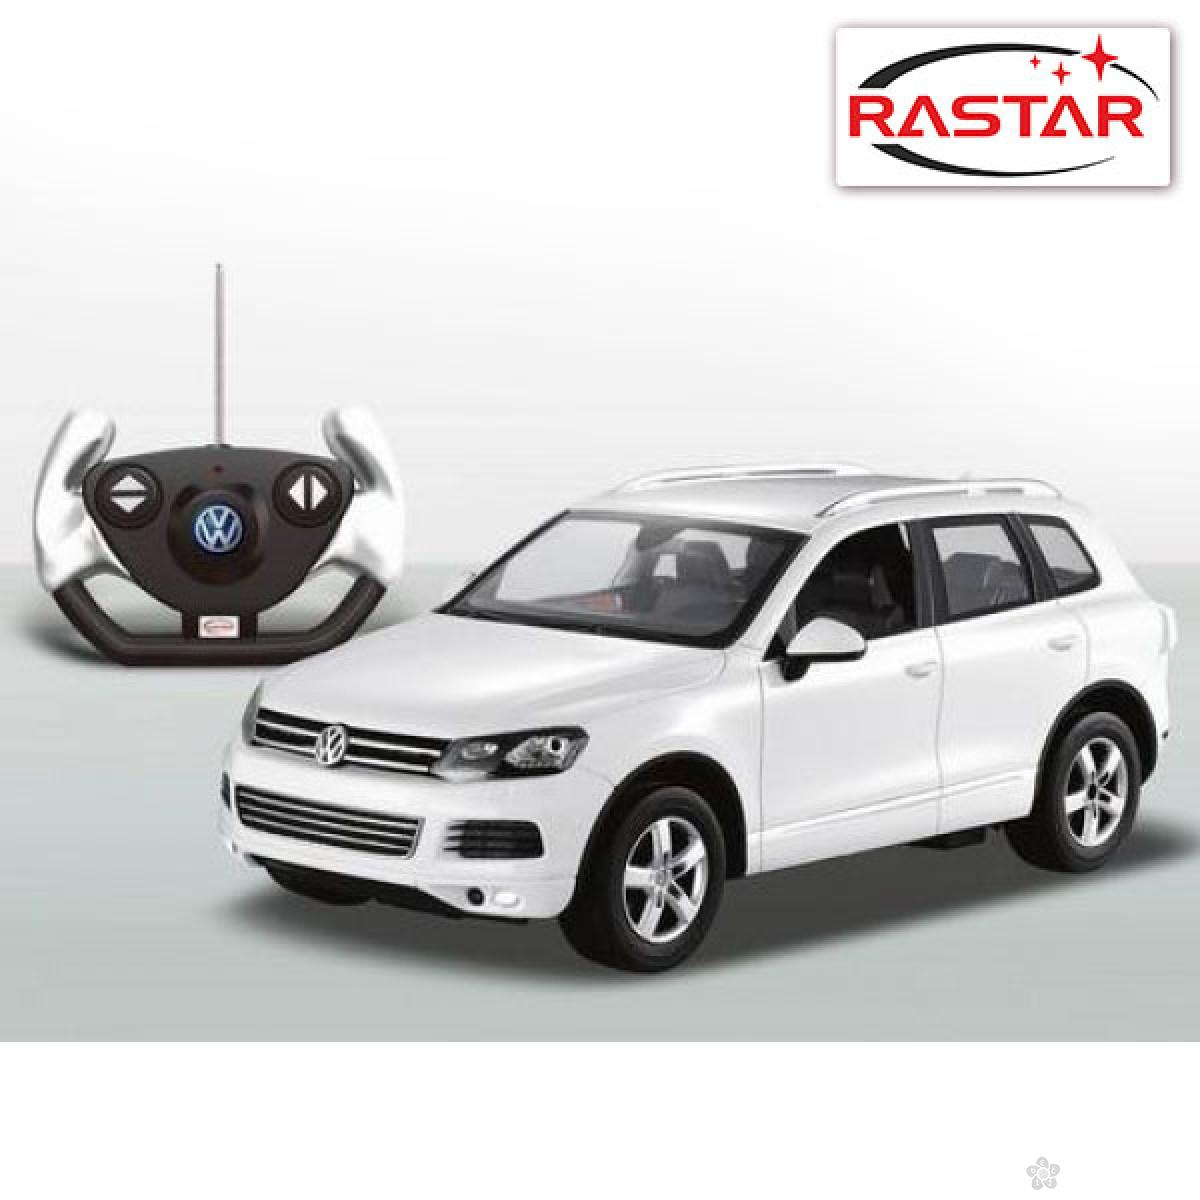 Auto na daljinsko upravljanje Rastar 1:14 Volkswagen T, 49300